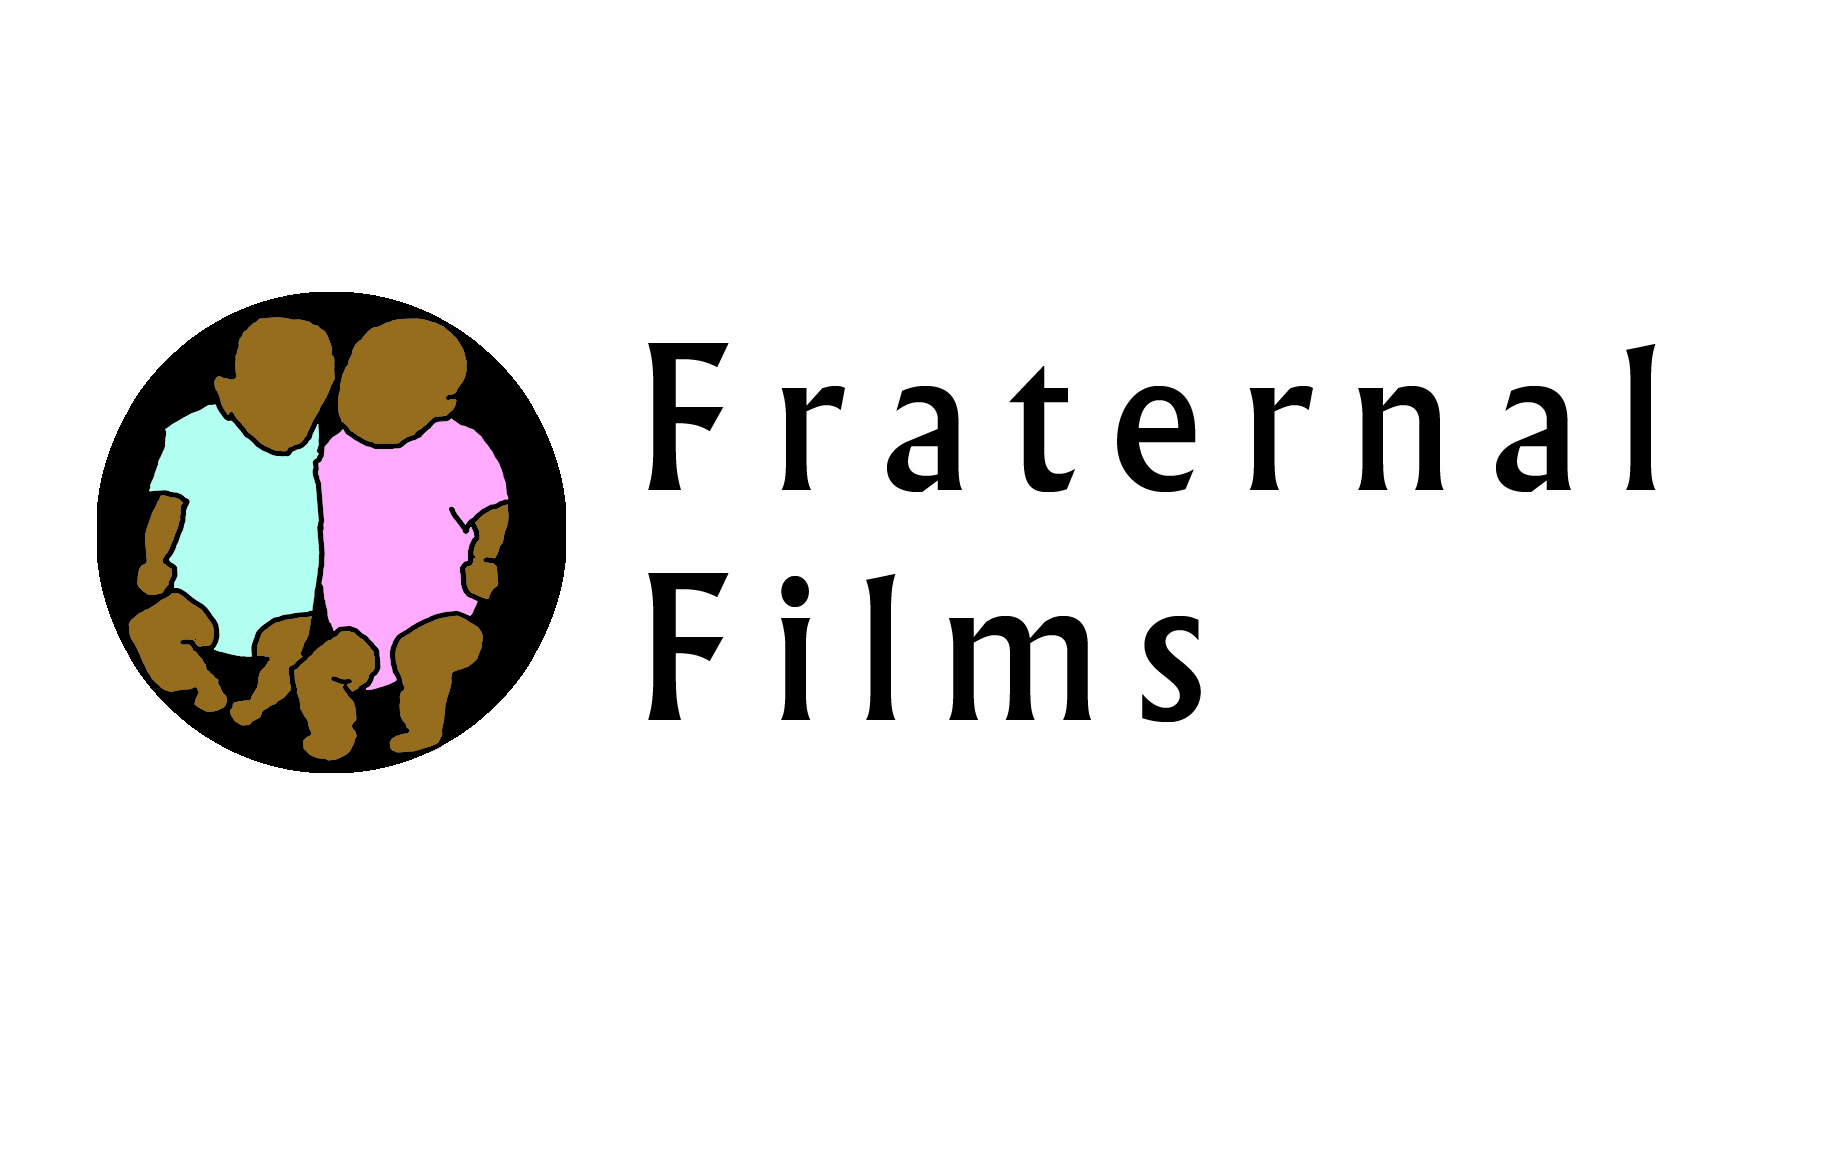 FRATERNAL FILMS